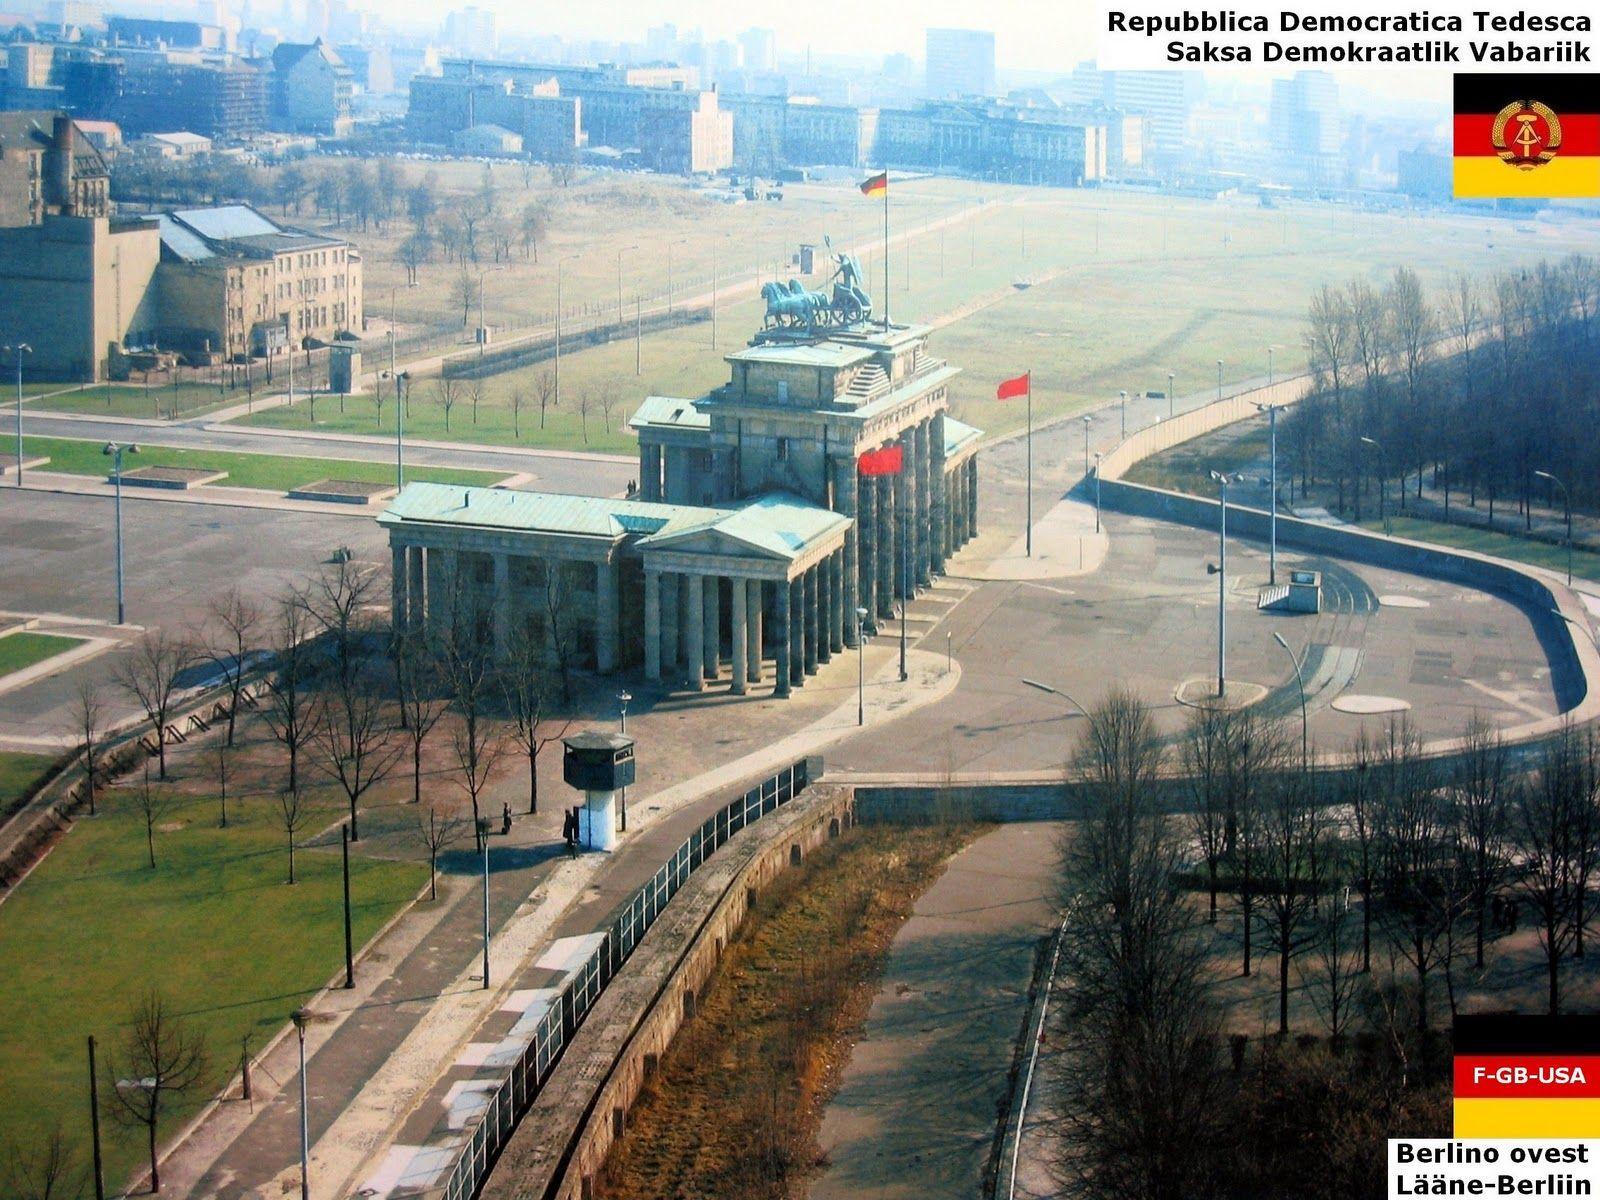 1988 Dd De Ida Saksamaa Saksamaa Rdt Germania Dell Est Germania Berlin Wall West Berlin Germany